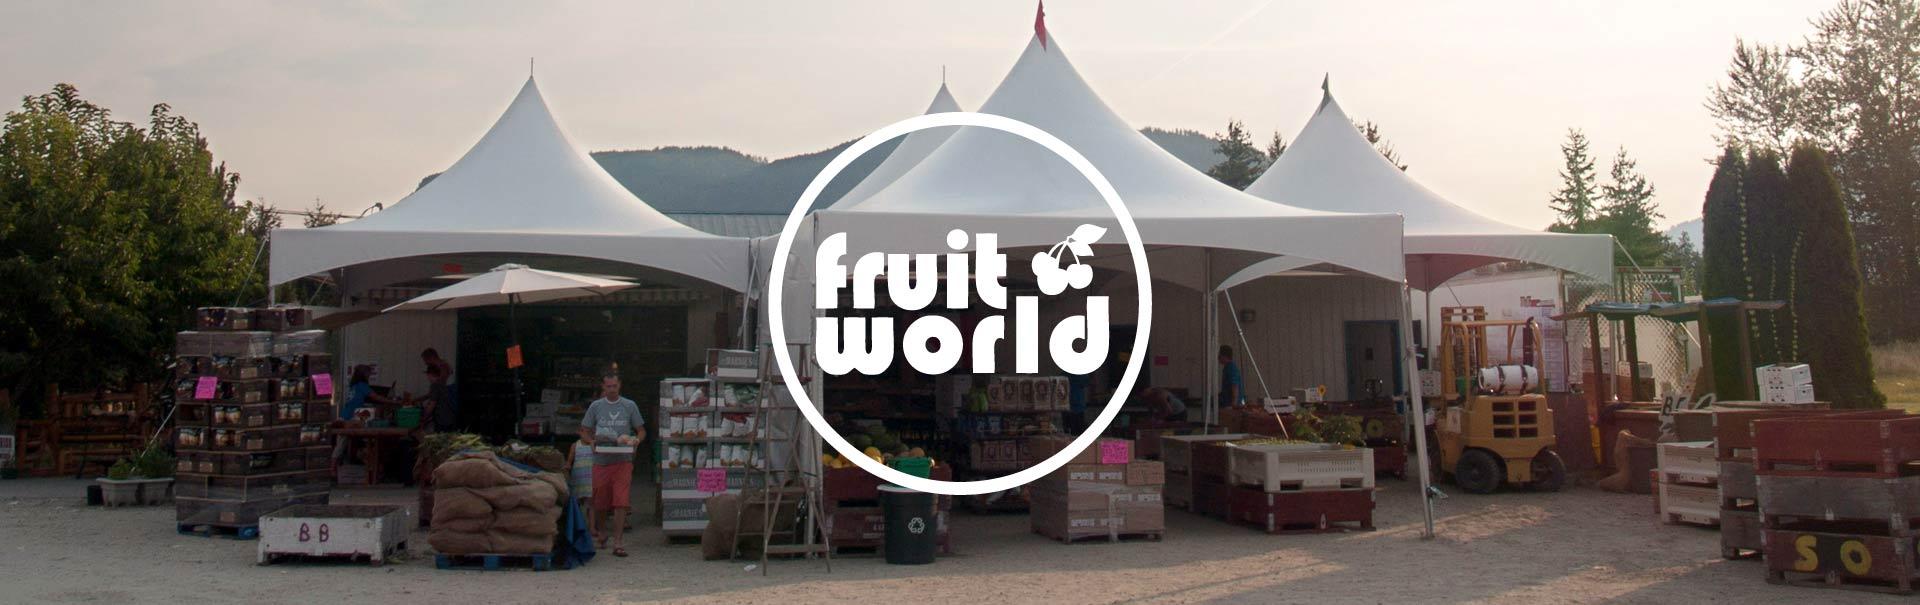 fruitworld store